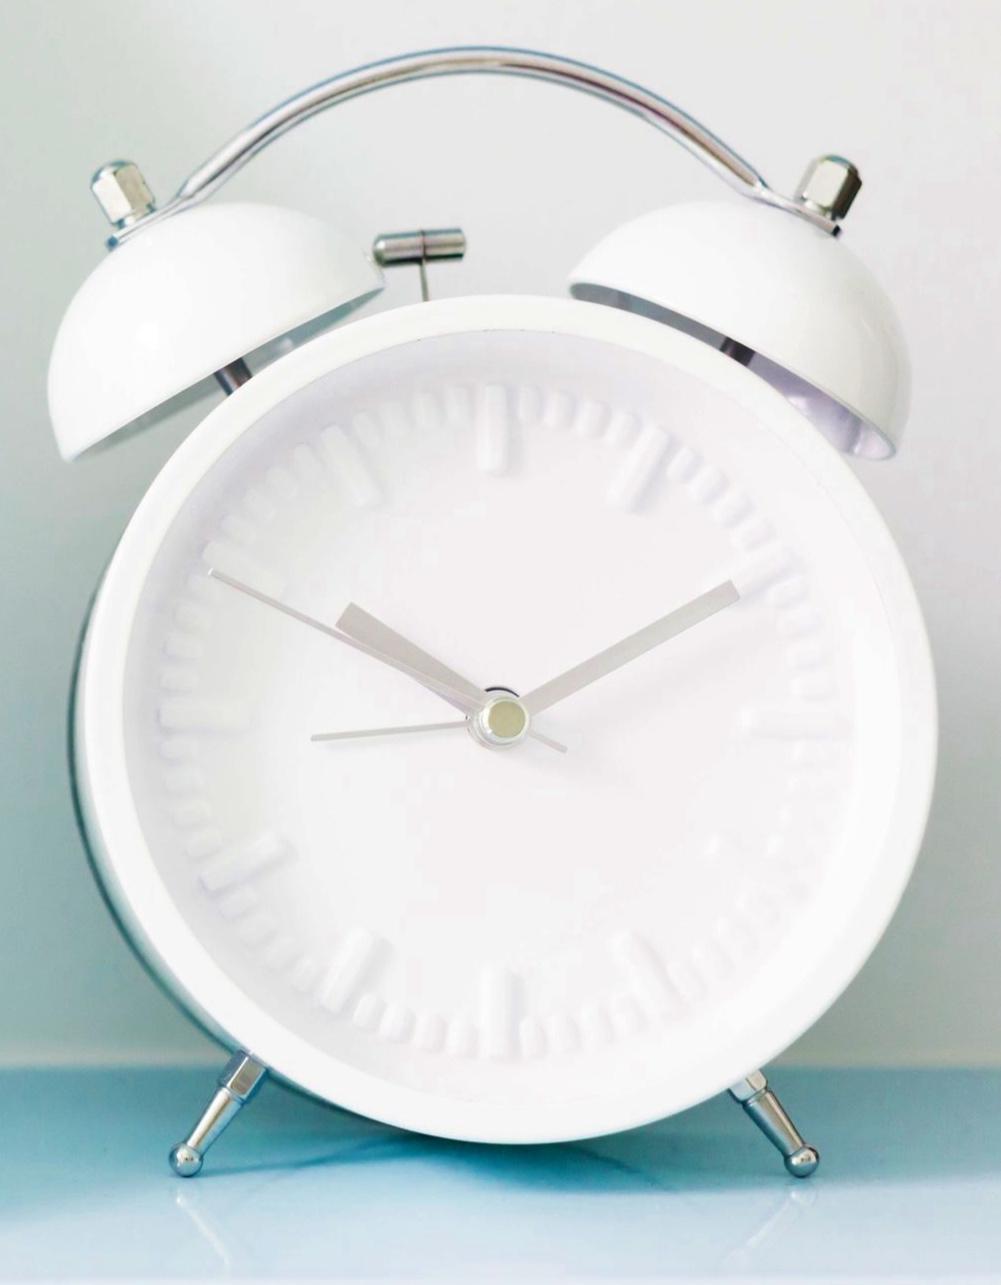 white-alarm-clock_4460x4460.jpg